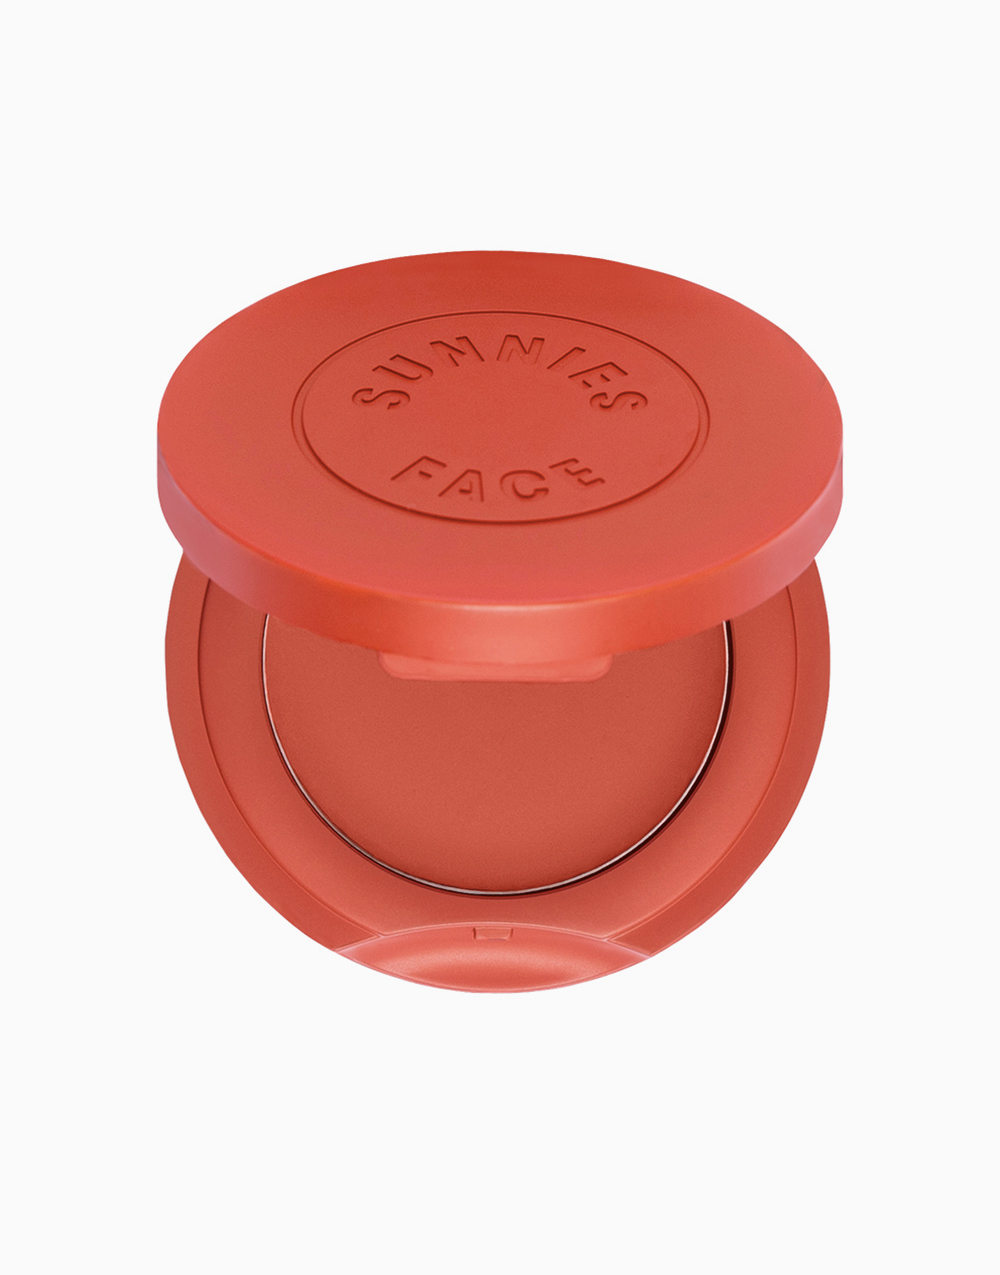 Sunnies Face Airblush [Cream Blush & Cheek Tint] (Peached) by Sunnies Face | Peached